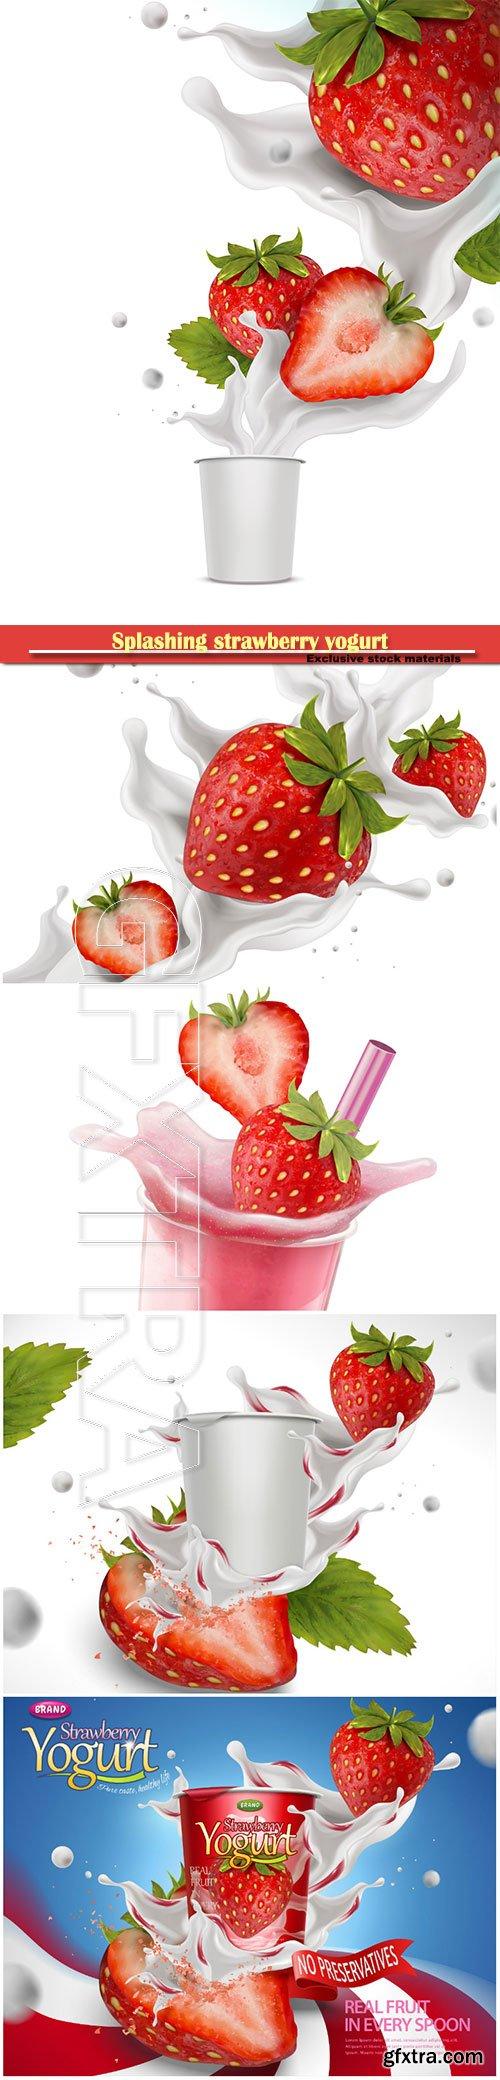 Splashing strawberry yogurt with fresh fruit in 3d illustration